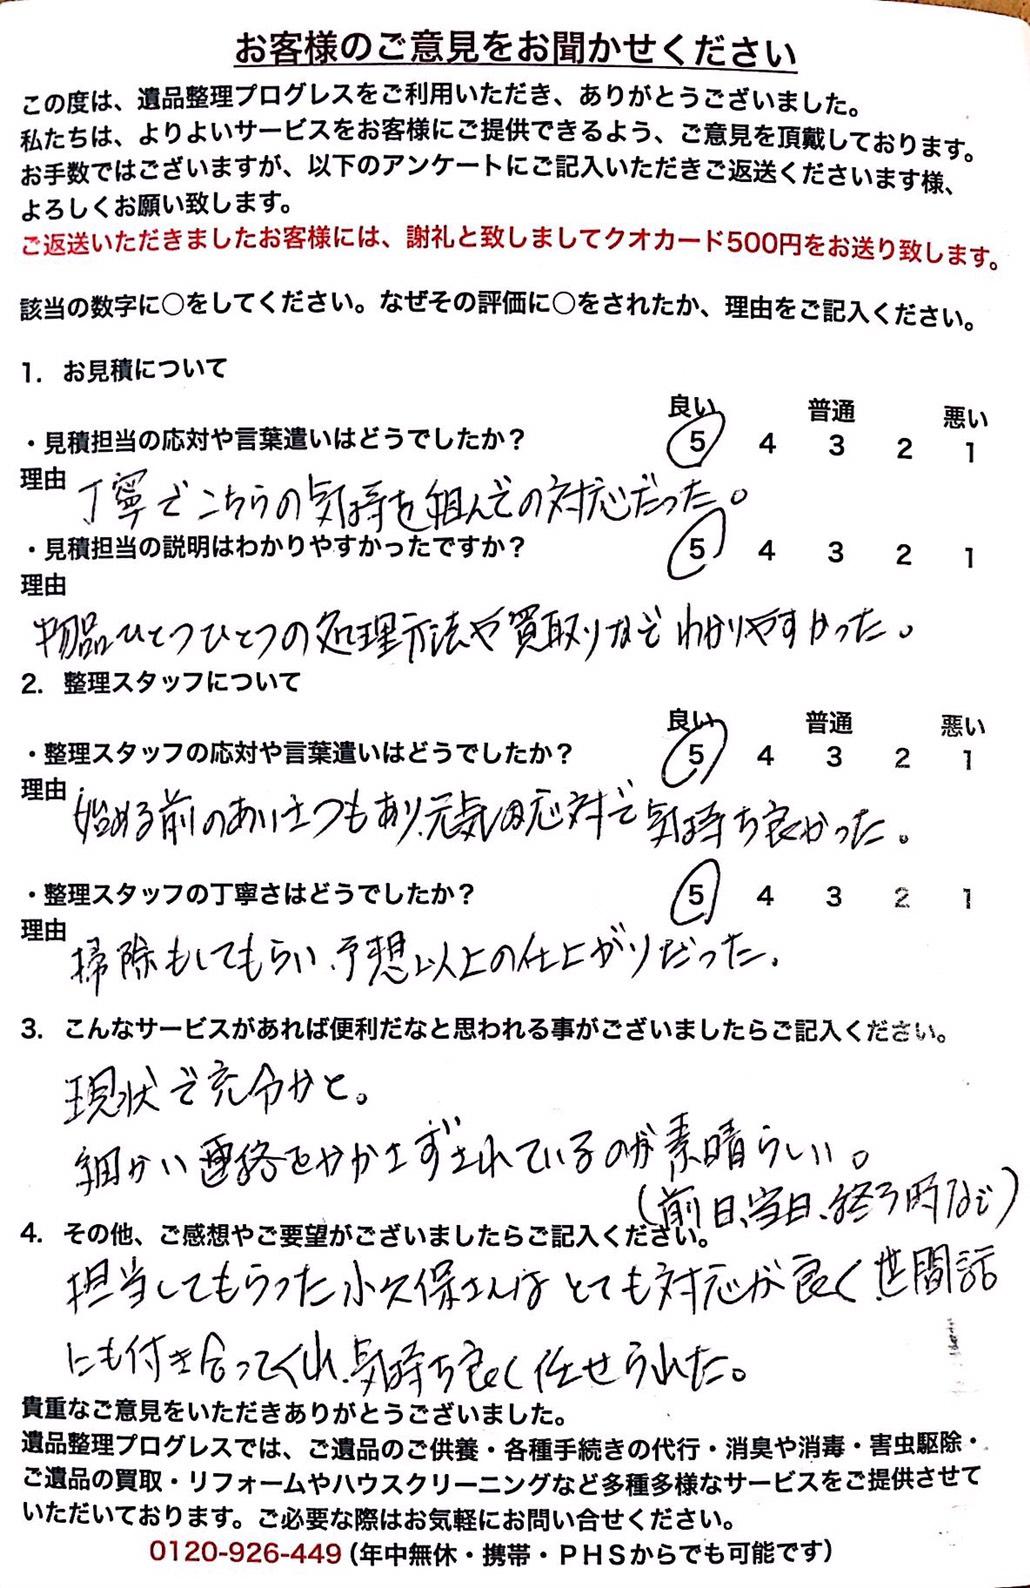 W・Y様 愛知県北名古屋市のアンケート用紙